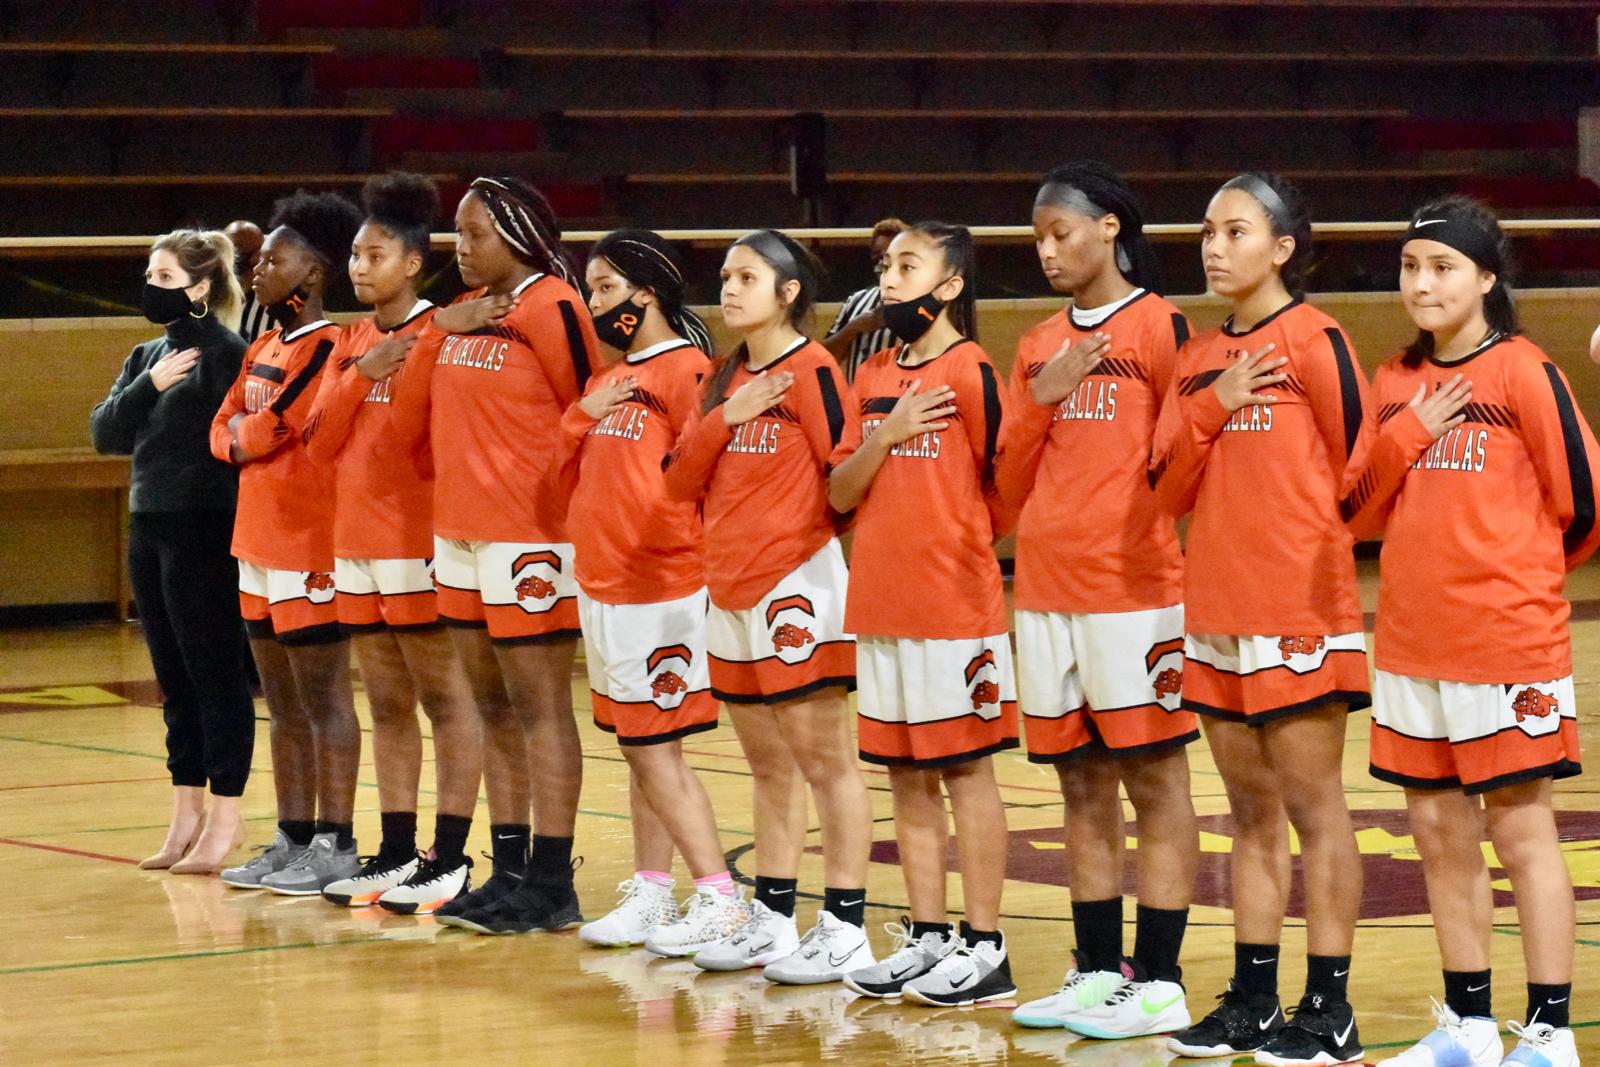 Photo gallery: North Dallas girls varsity basketball team vs. Seagoville — Nov. 18, 2020